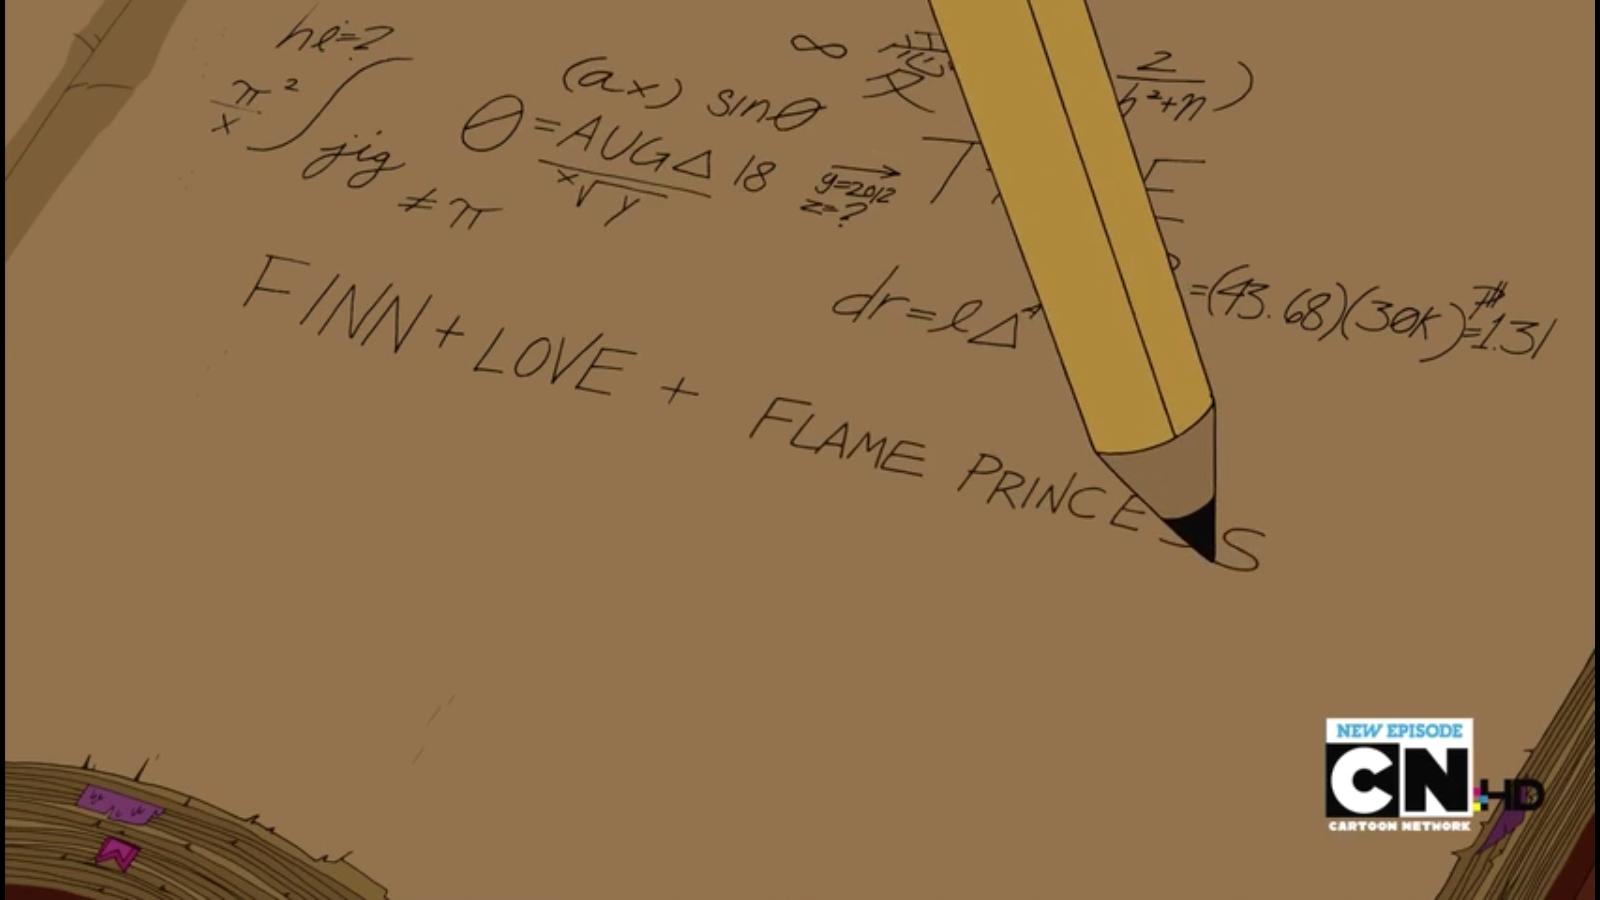 S4e16 PB's diary equations